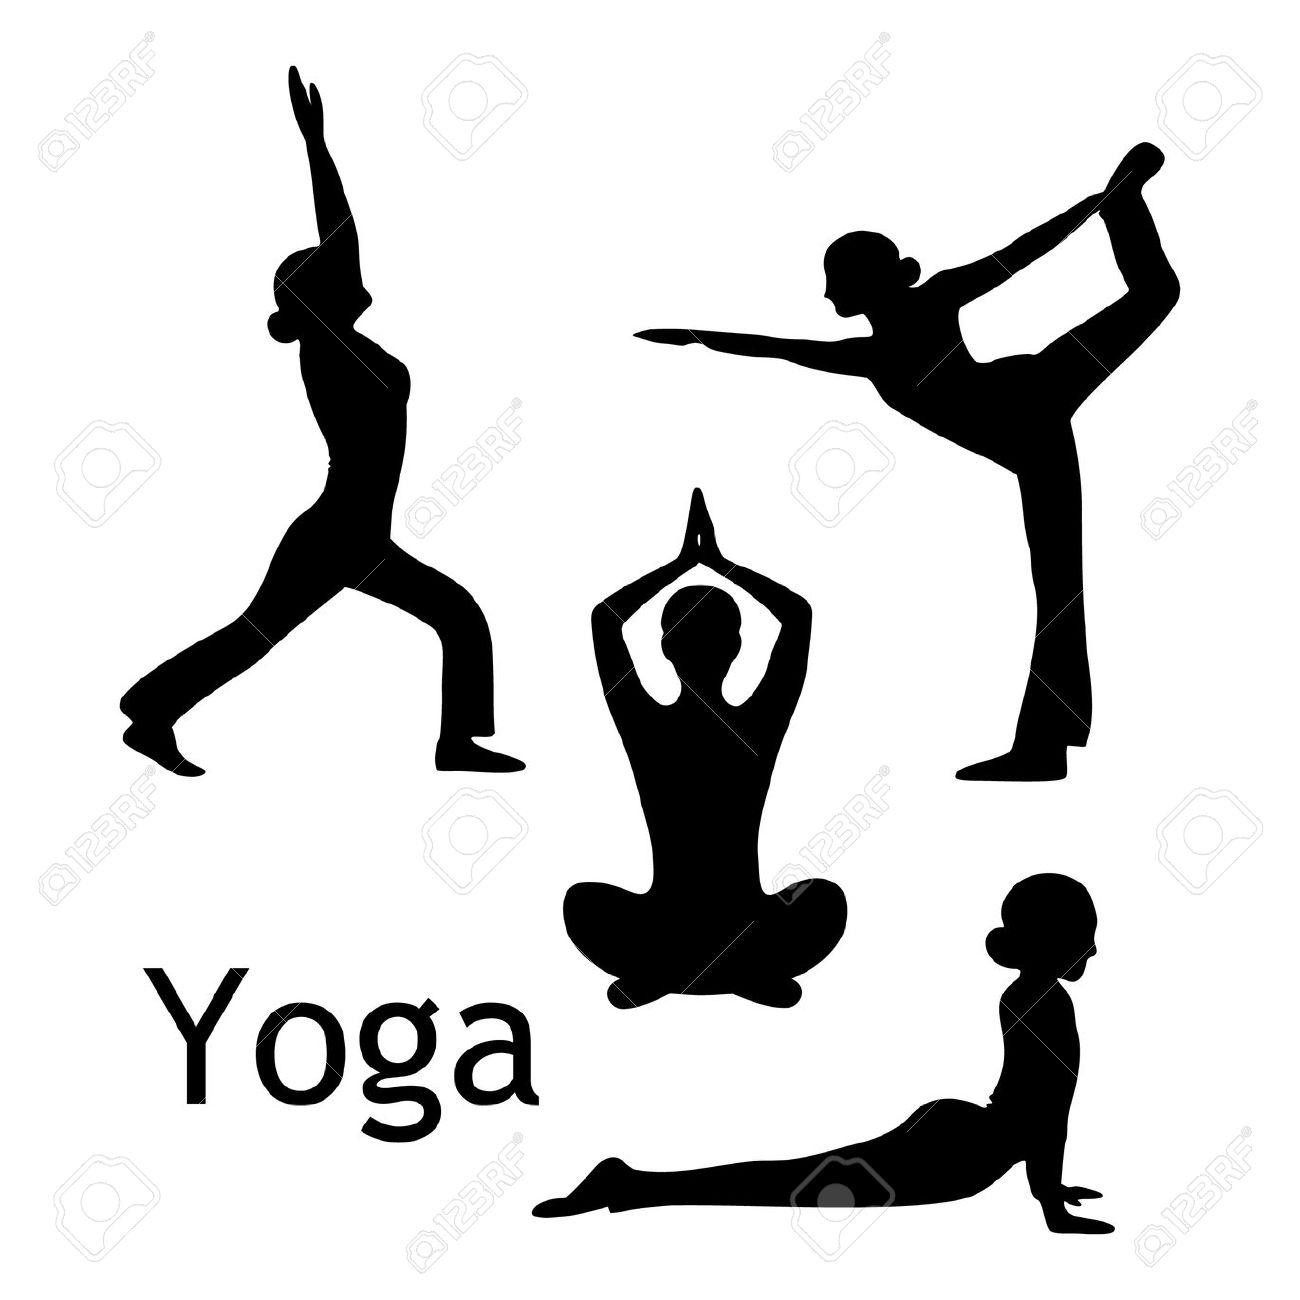 Yoga images clip art - .-Yoga images clip art - .-8